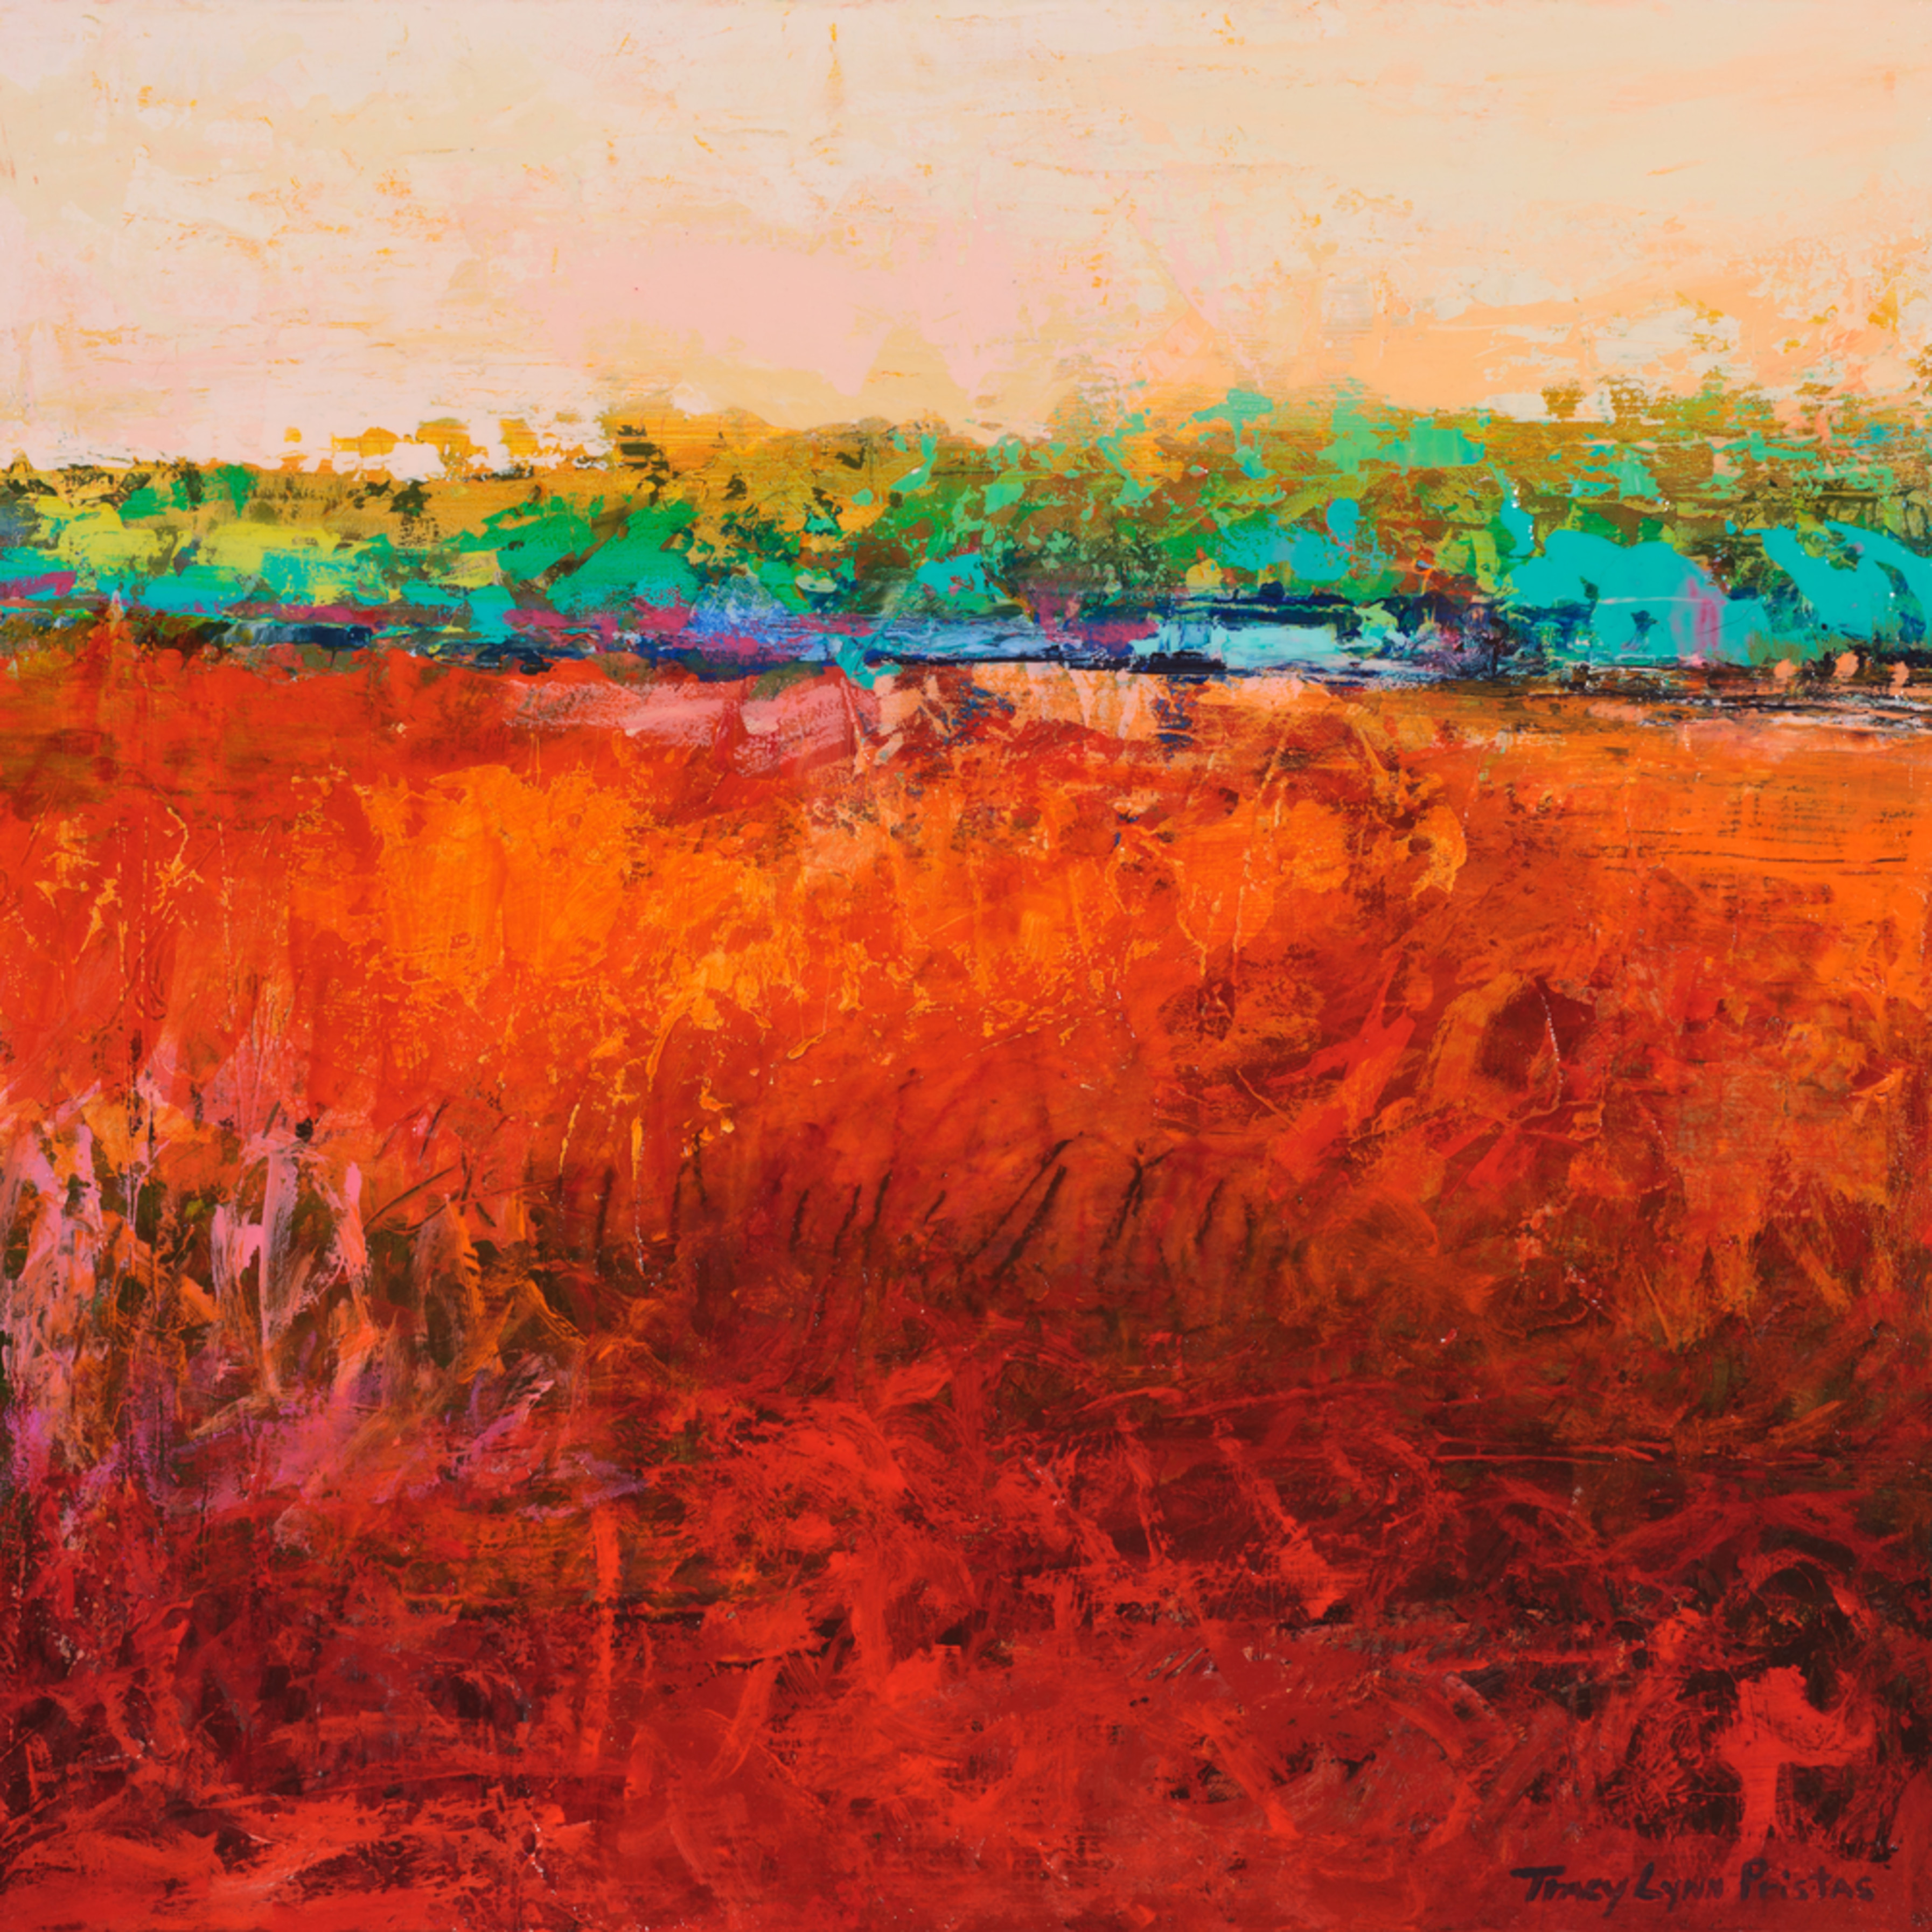 Tracy lynn pristas  abstract landscapes southwestern art  desert memories acrylic pastel on panel n3lalt